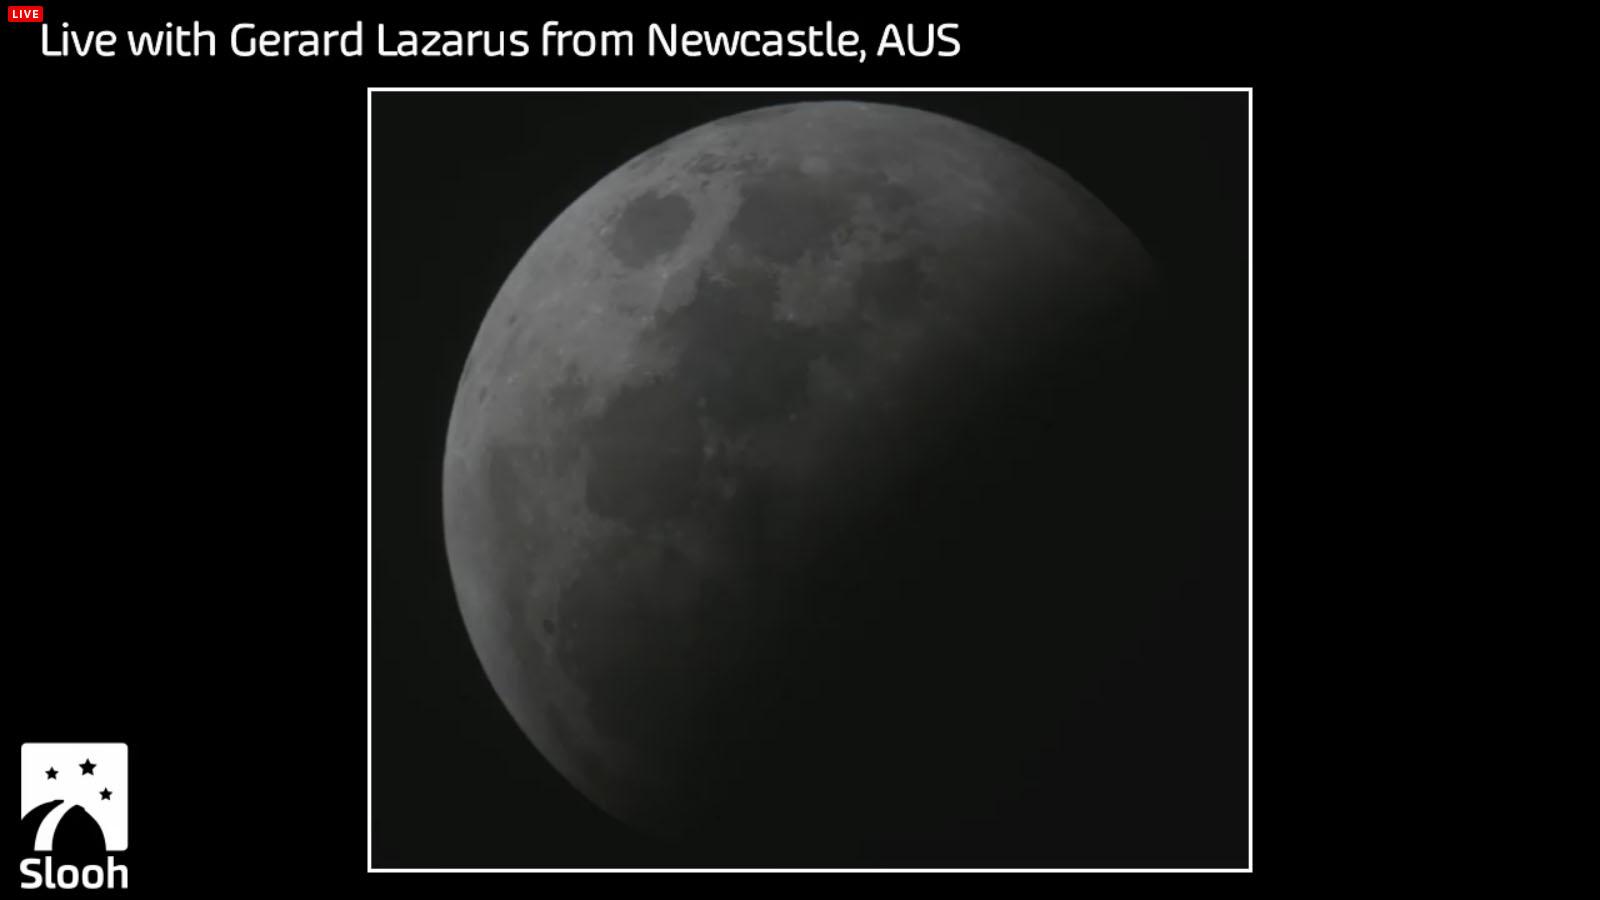 Total Lunar Eclipse of October 2014: Gerard Lazarus